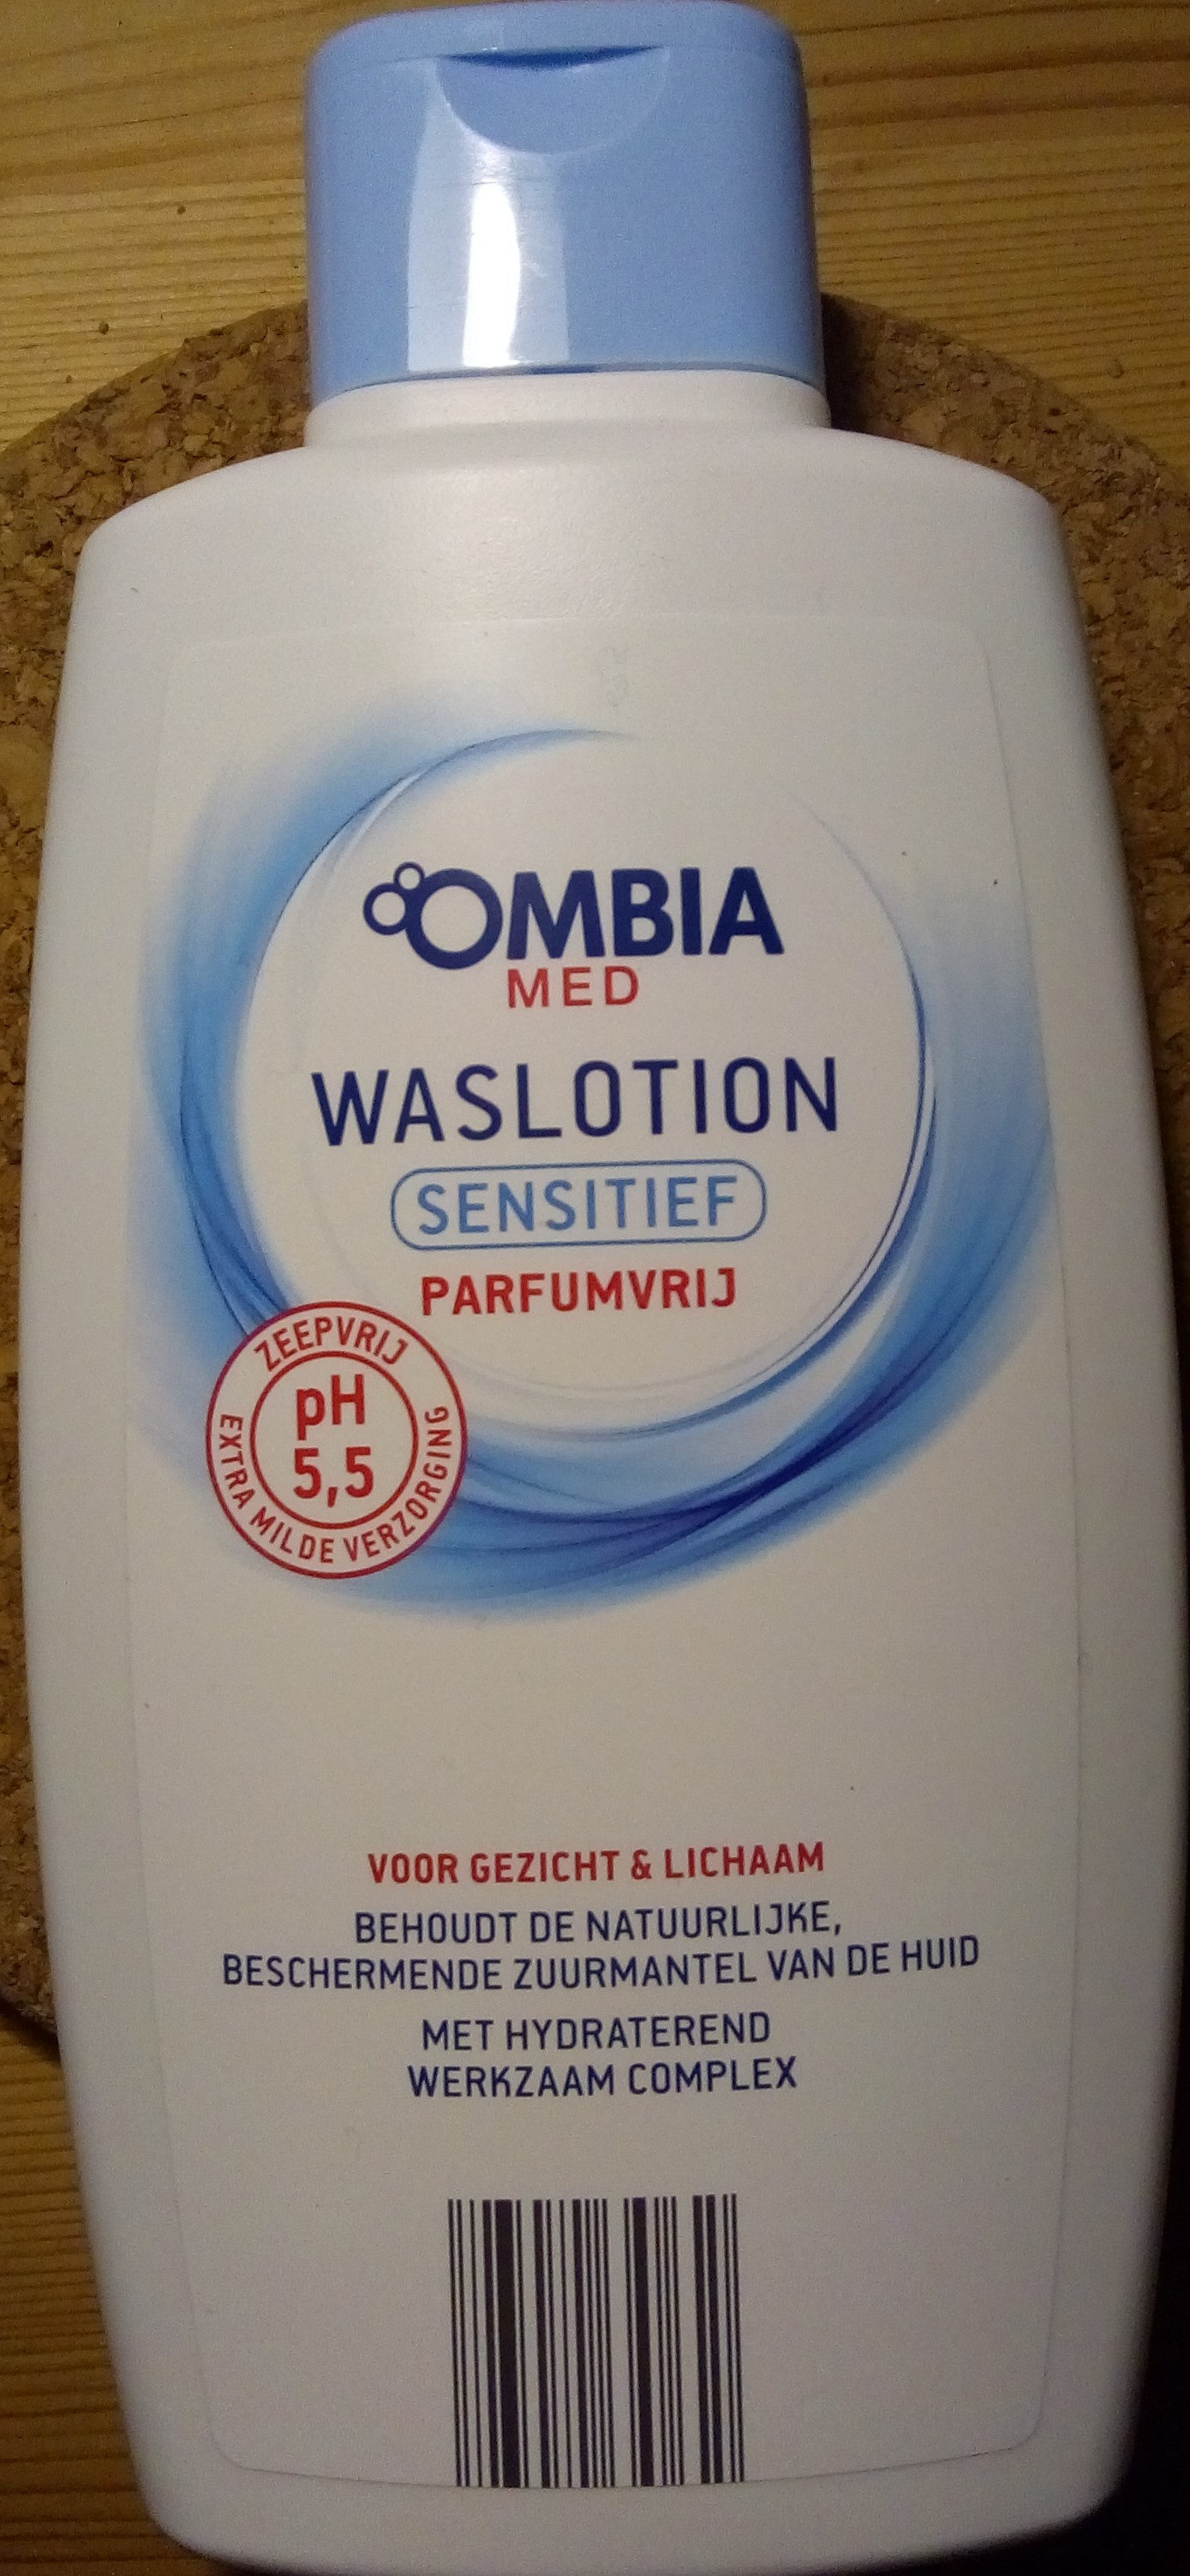 Ombia Med waslotion sensitief - Ingredients